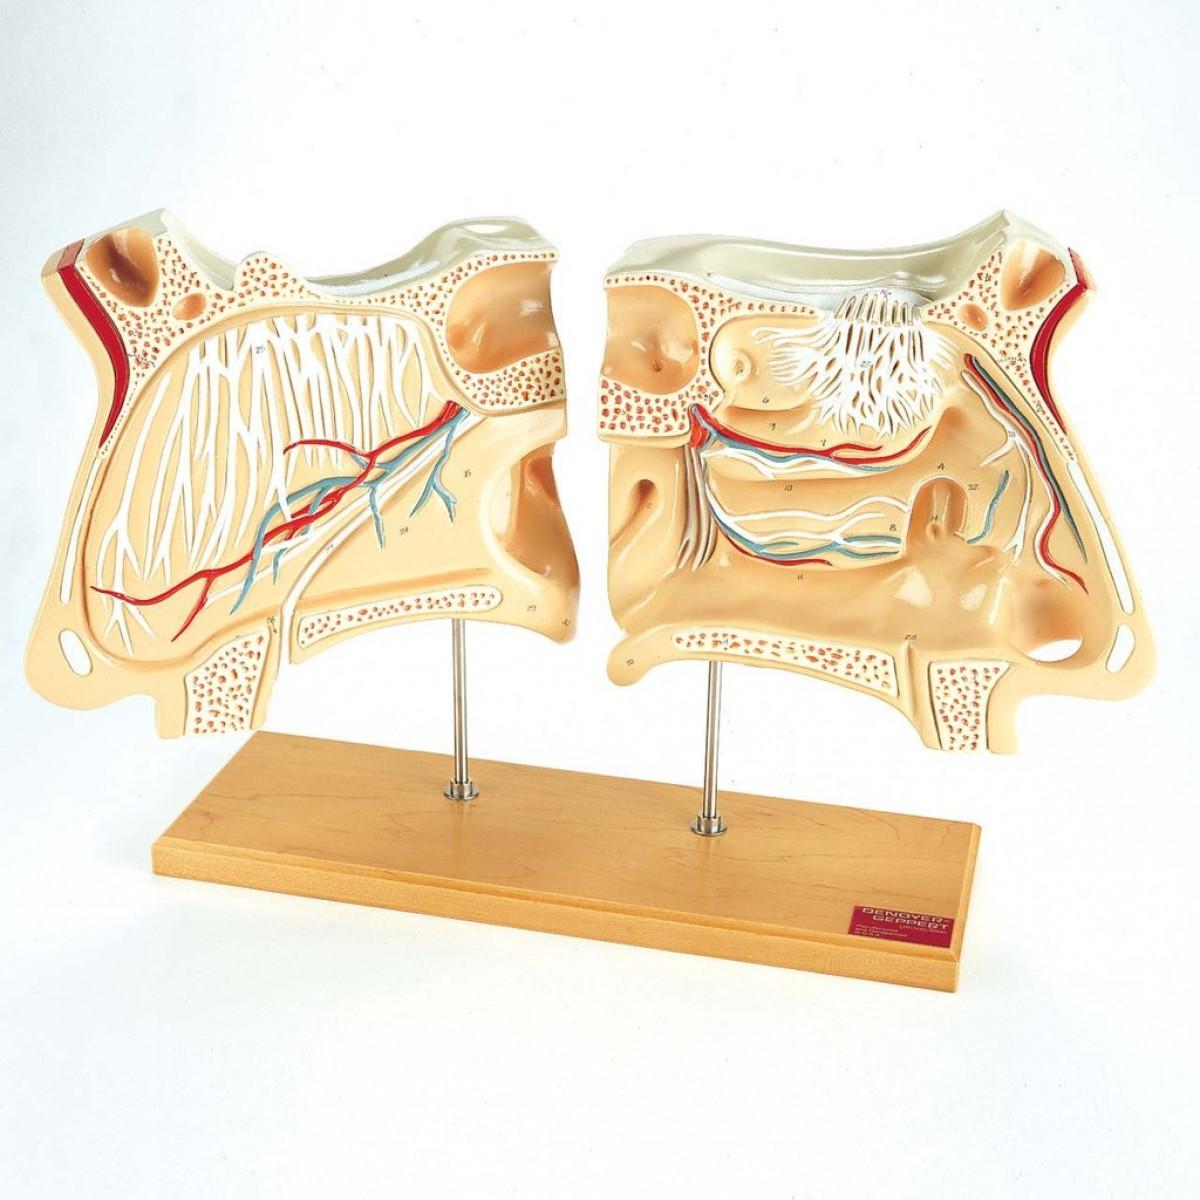 Denoyer Nose and Olfactory Organ Set - Sense Organs - Human Anatomy ...